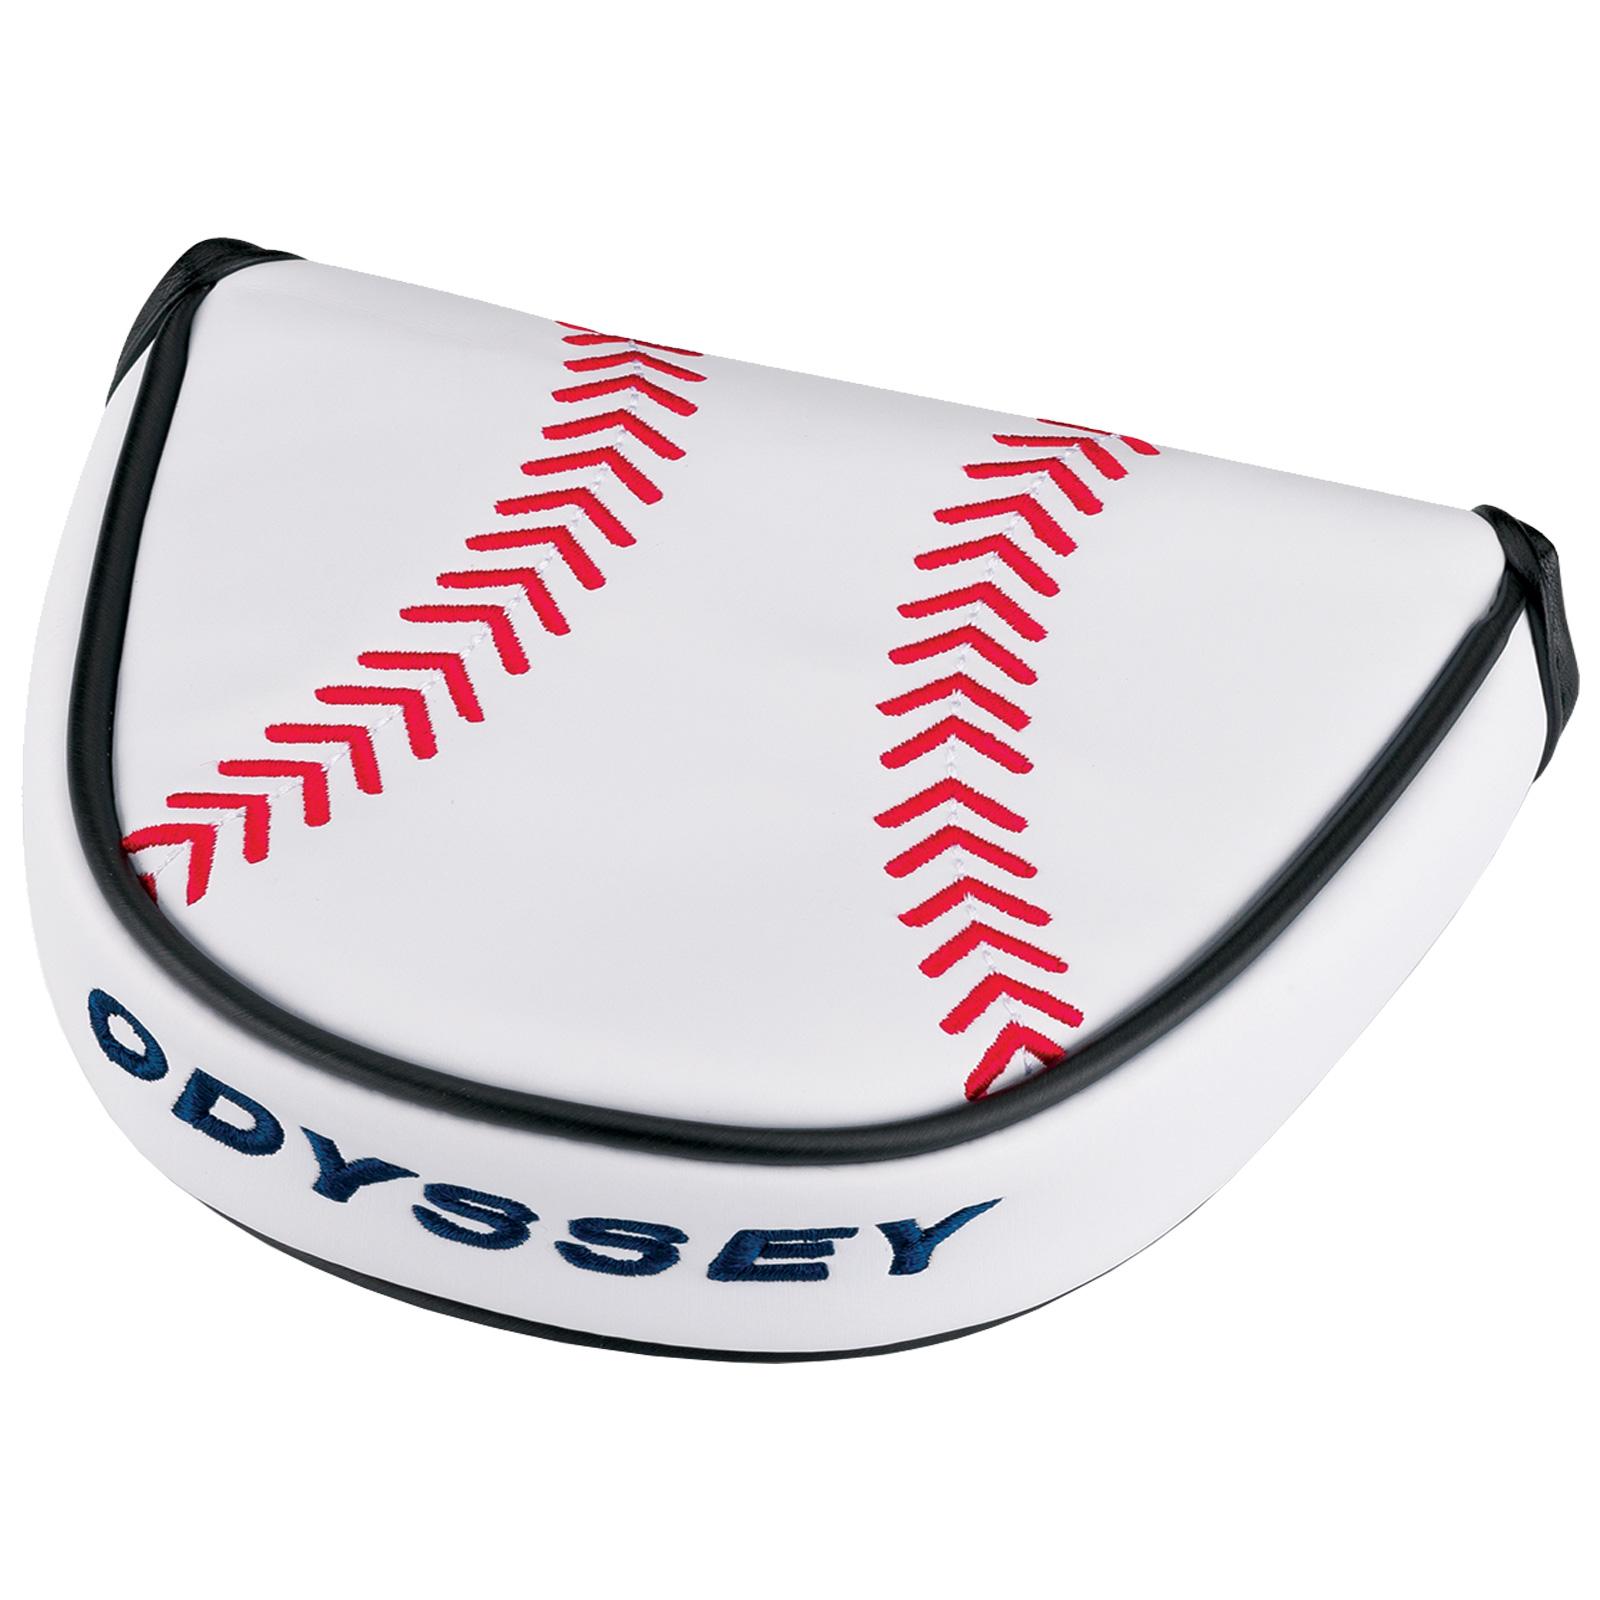 Indexbild 22 - Odyssey Golf Putter Headcovers - Mallet Blade Swirl Novelty Universal Cover